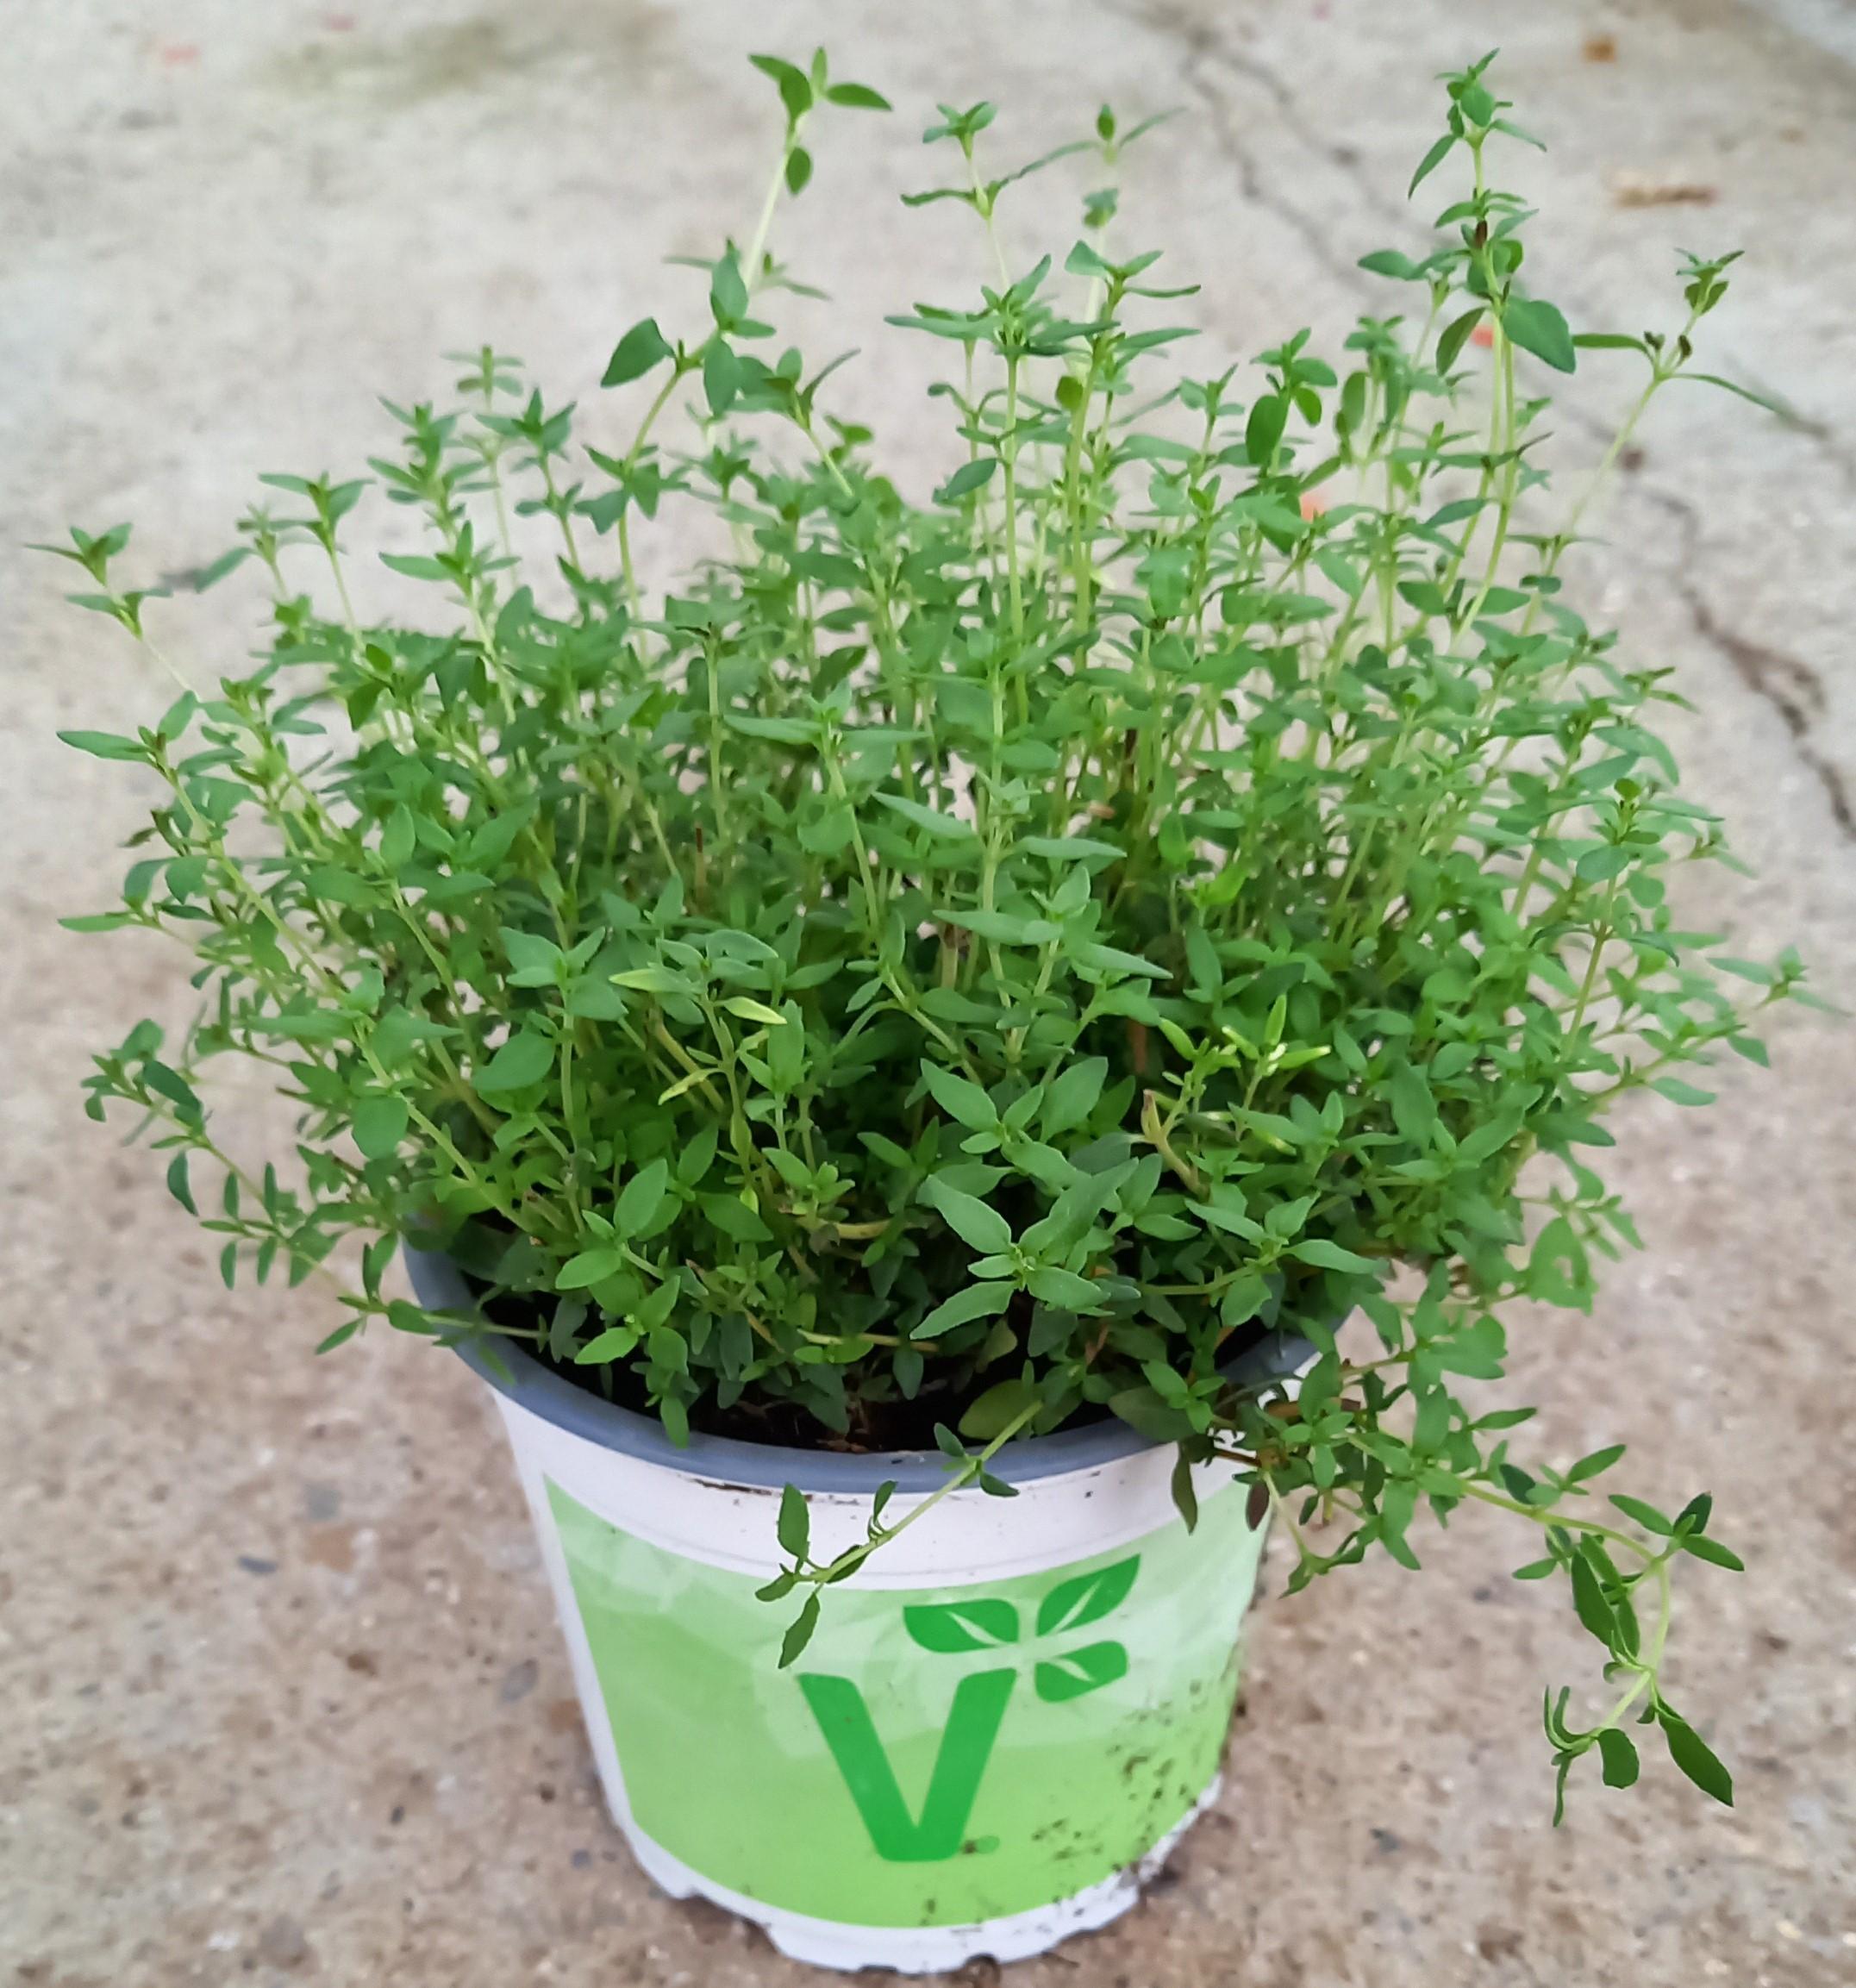 Echter Thymian (Thymus vulgare) 'Tim' T12 - winterhart